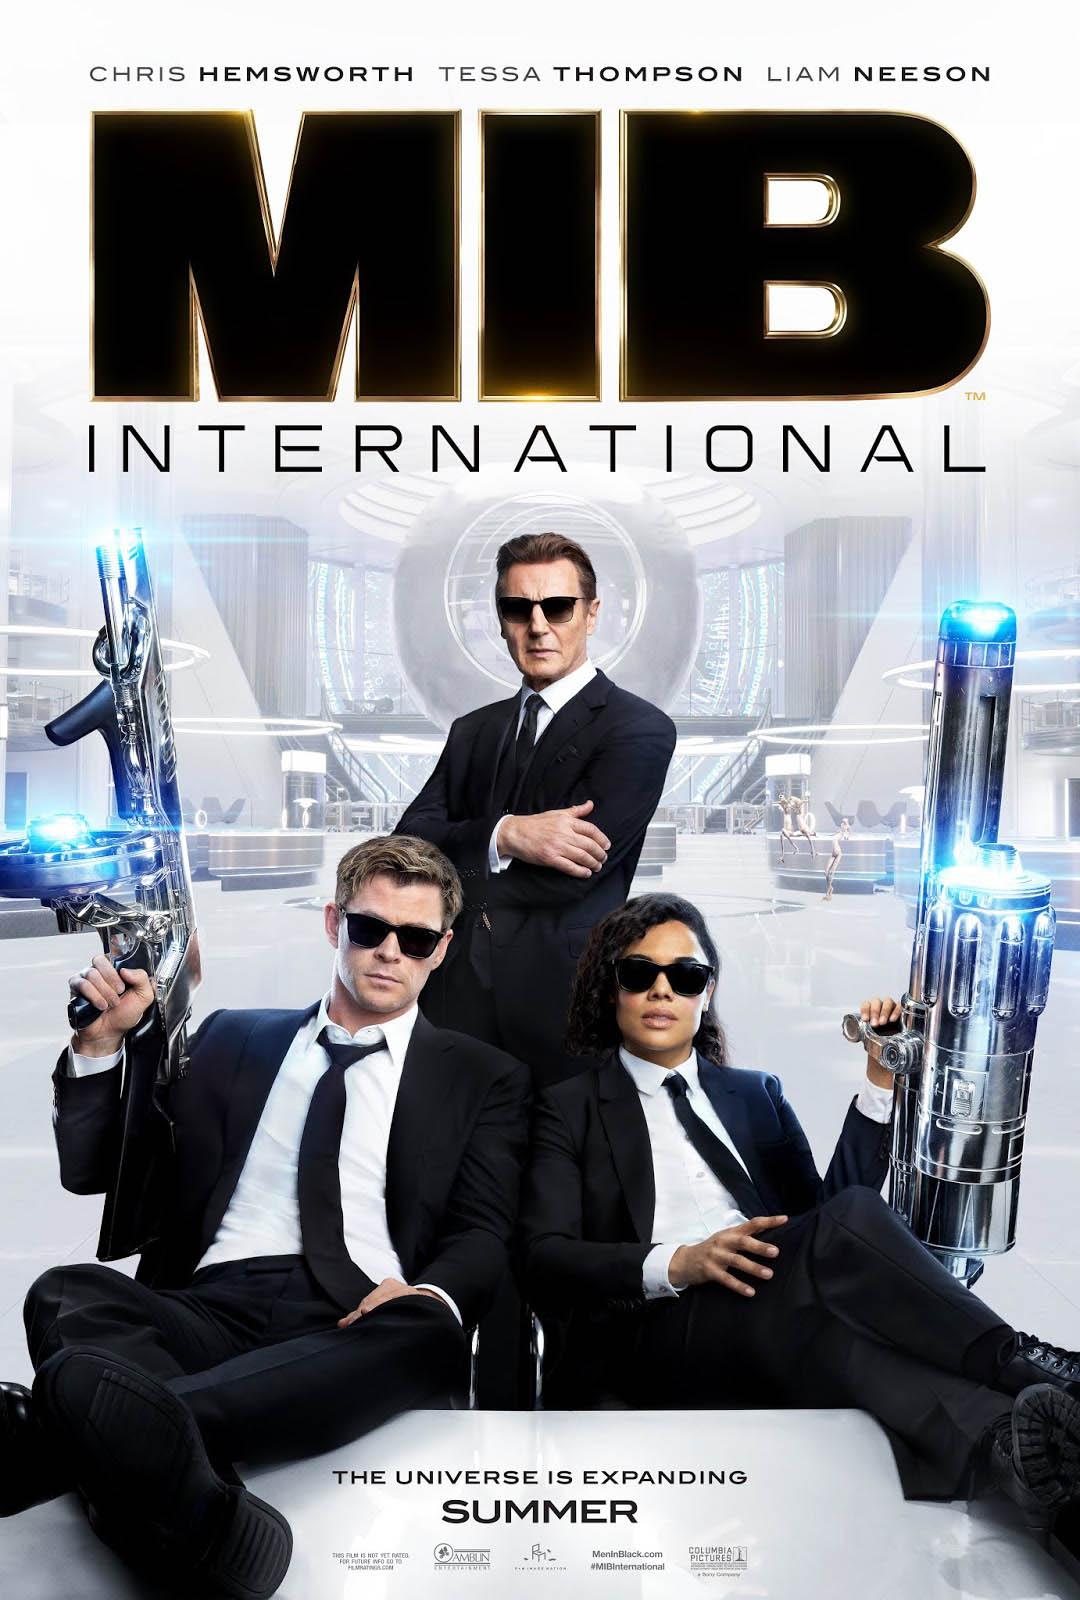 Men in Black: International Movie Free Online 与过往《X战警》系列电影不同的是,这部《X战警:新变种人》的预告中充满了浓浓的暗黑风格和神秘色彩。